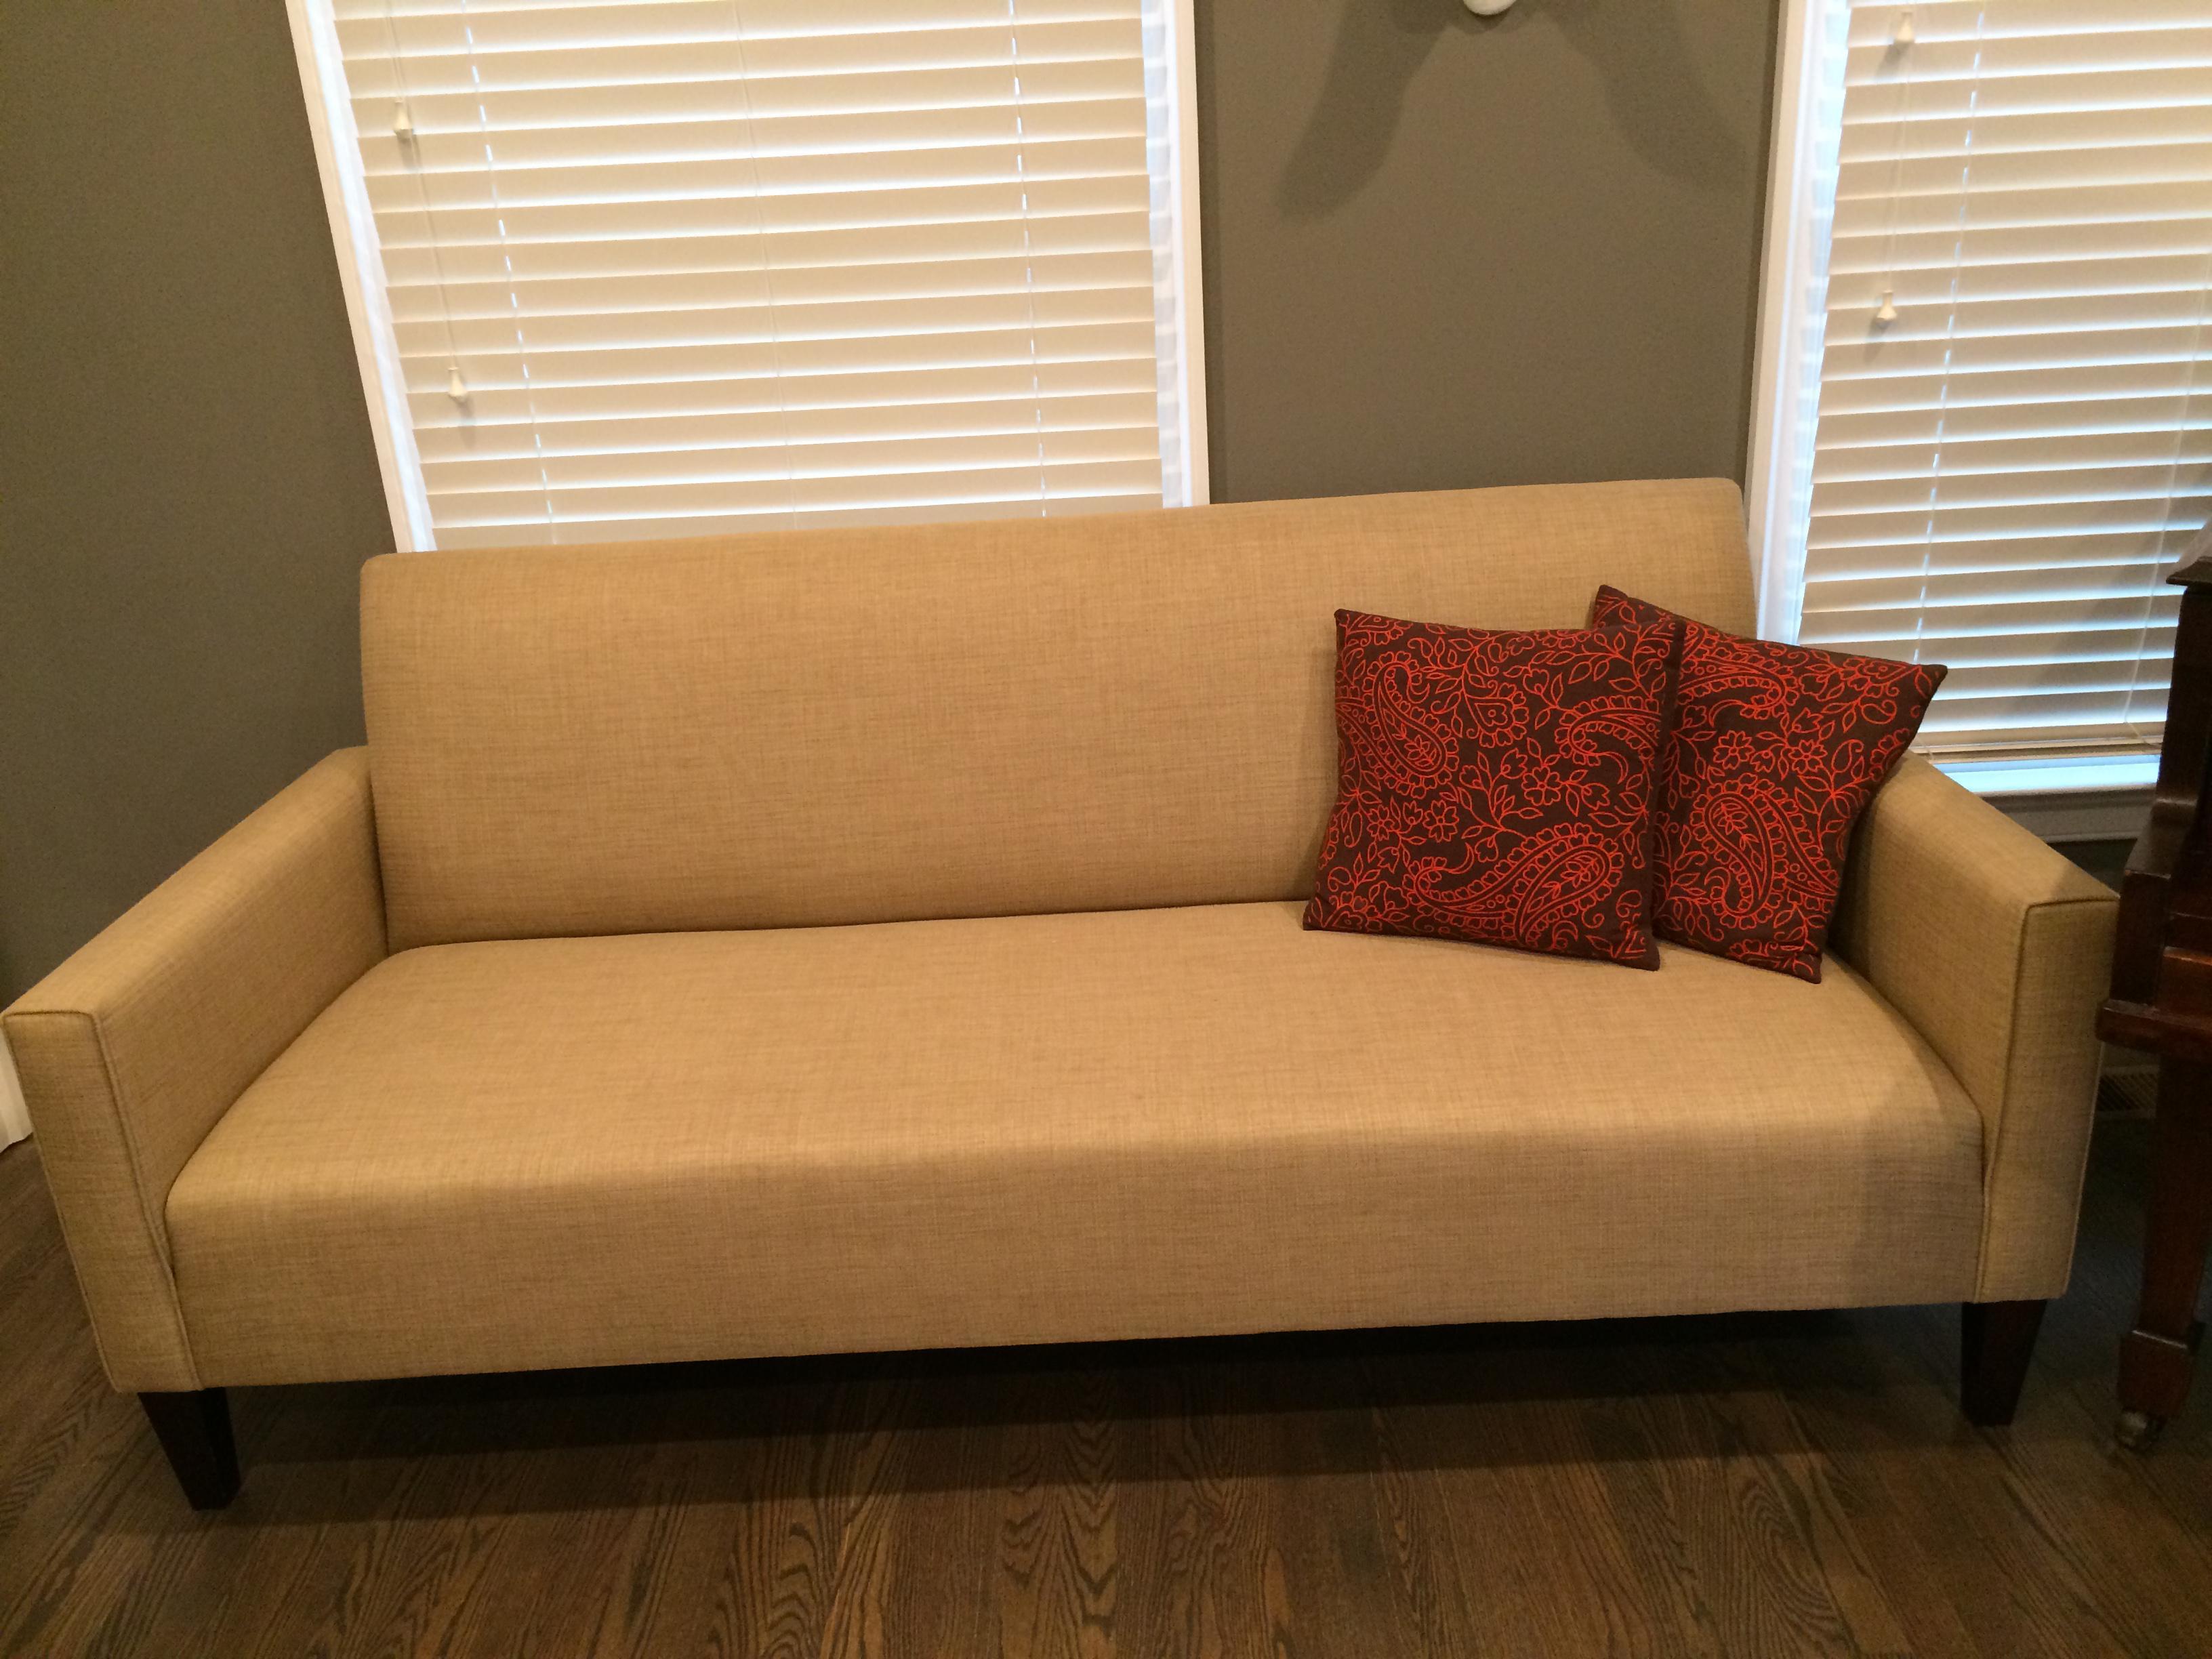 Moden Crate Barrel Tightback Sofa Chairish